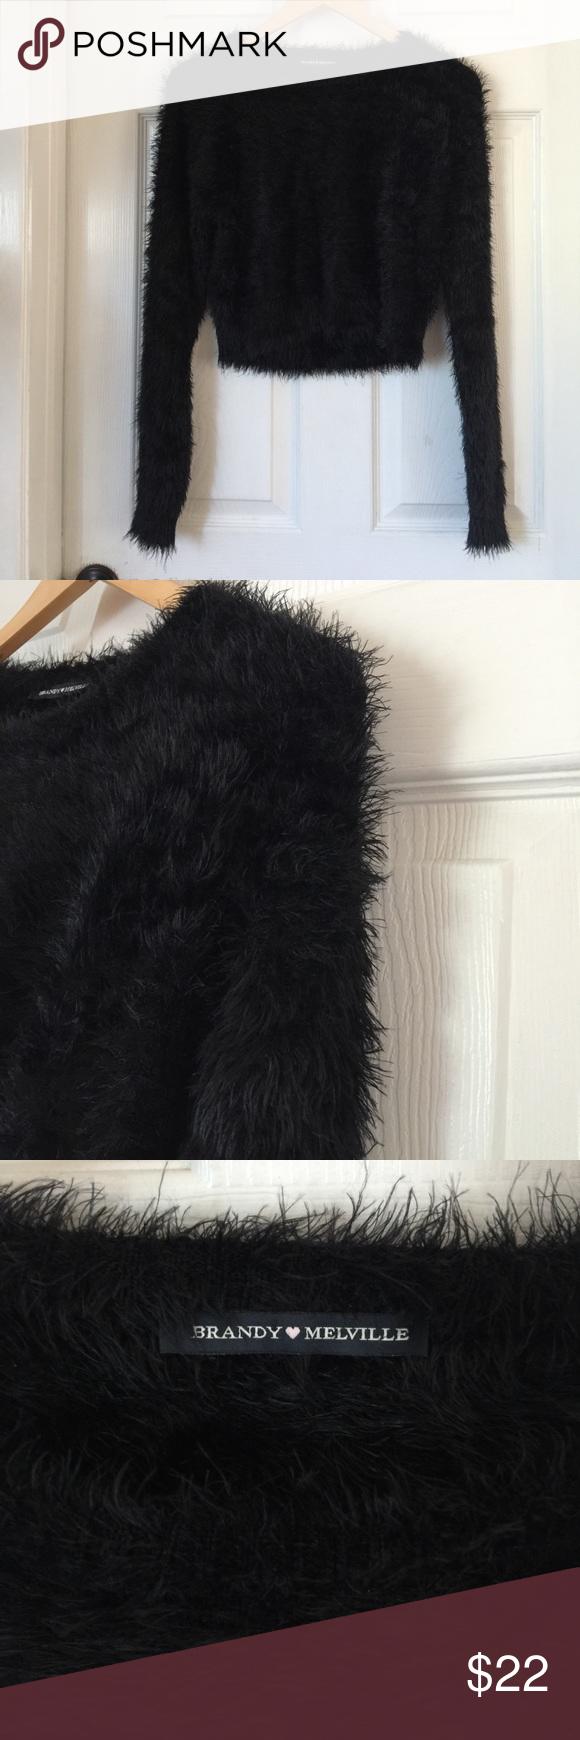 🌹Sale🌹Like-new Brandy Melville Fuzzy Sweater Black fuzzy sweater. Brandy Melville Sweaters